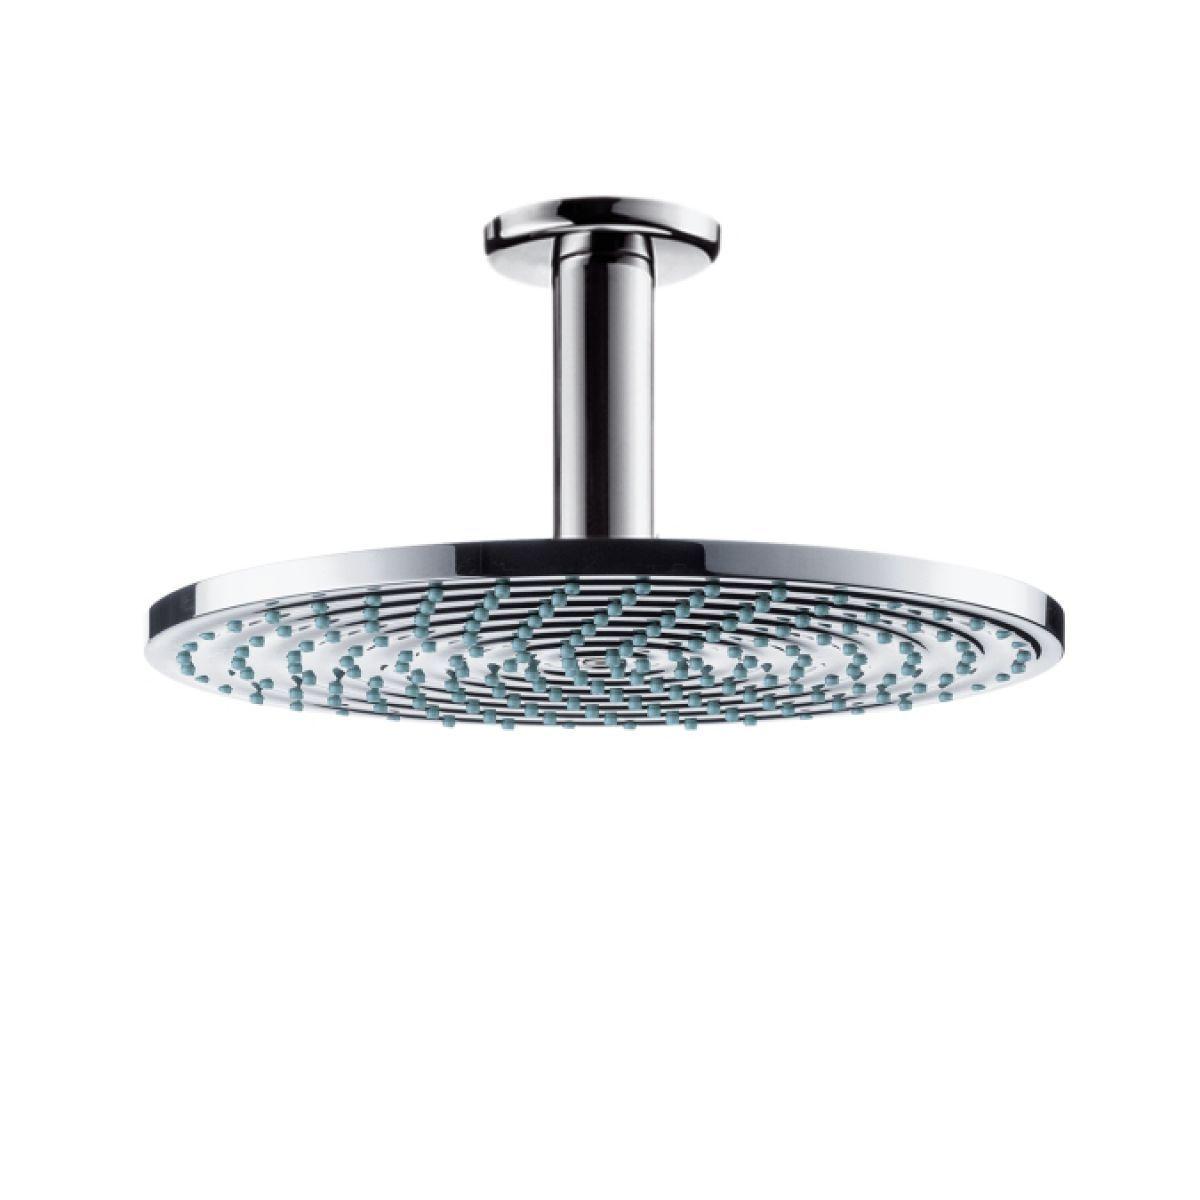 shower head hansgrohe raindance air 24cm 10cm arm 388.80 ukbathrooms ...